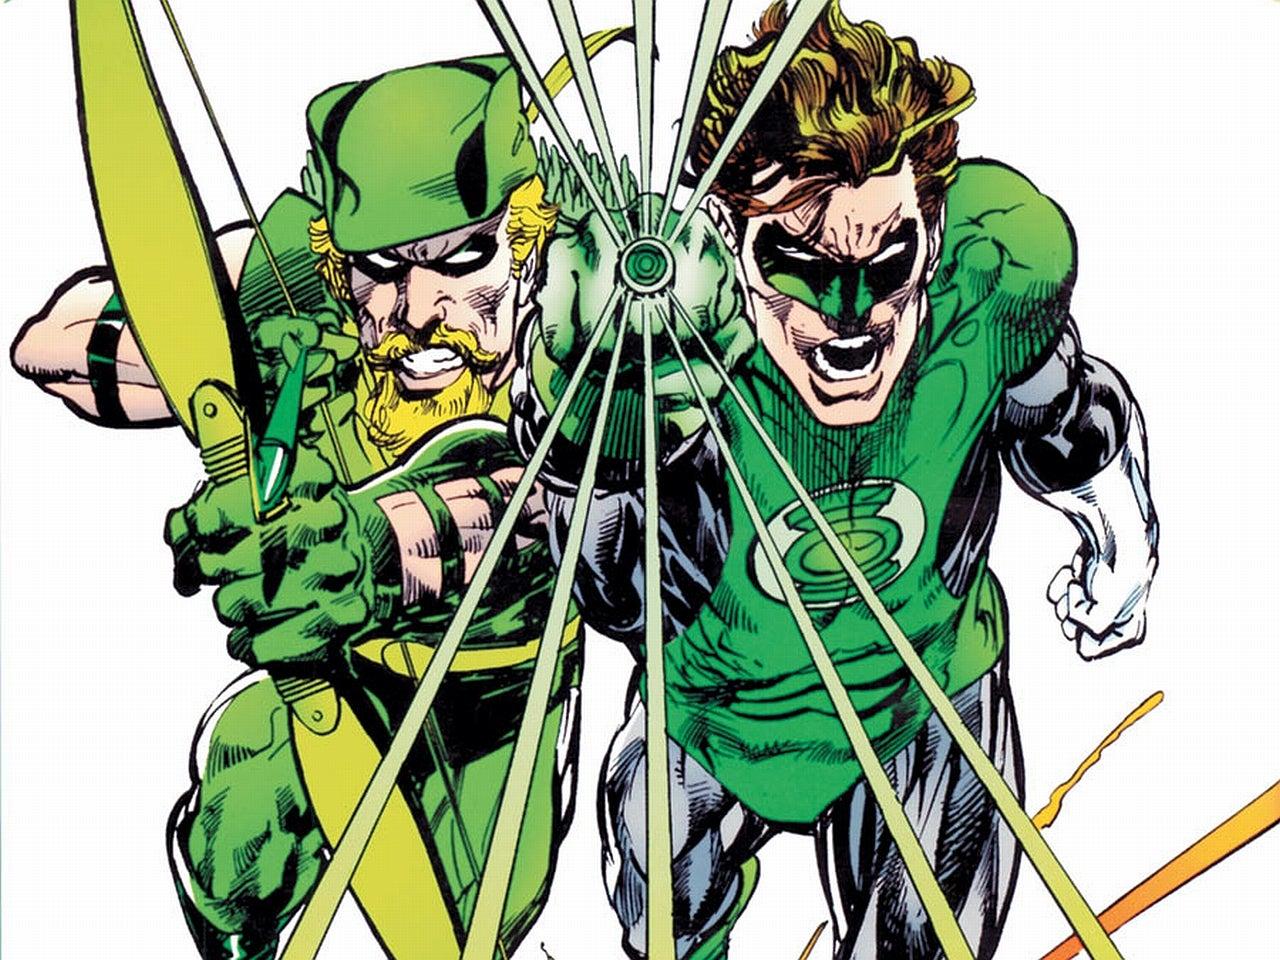 green-lantern-green-arrow-neal-adams